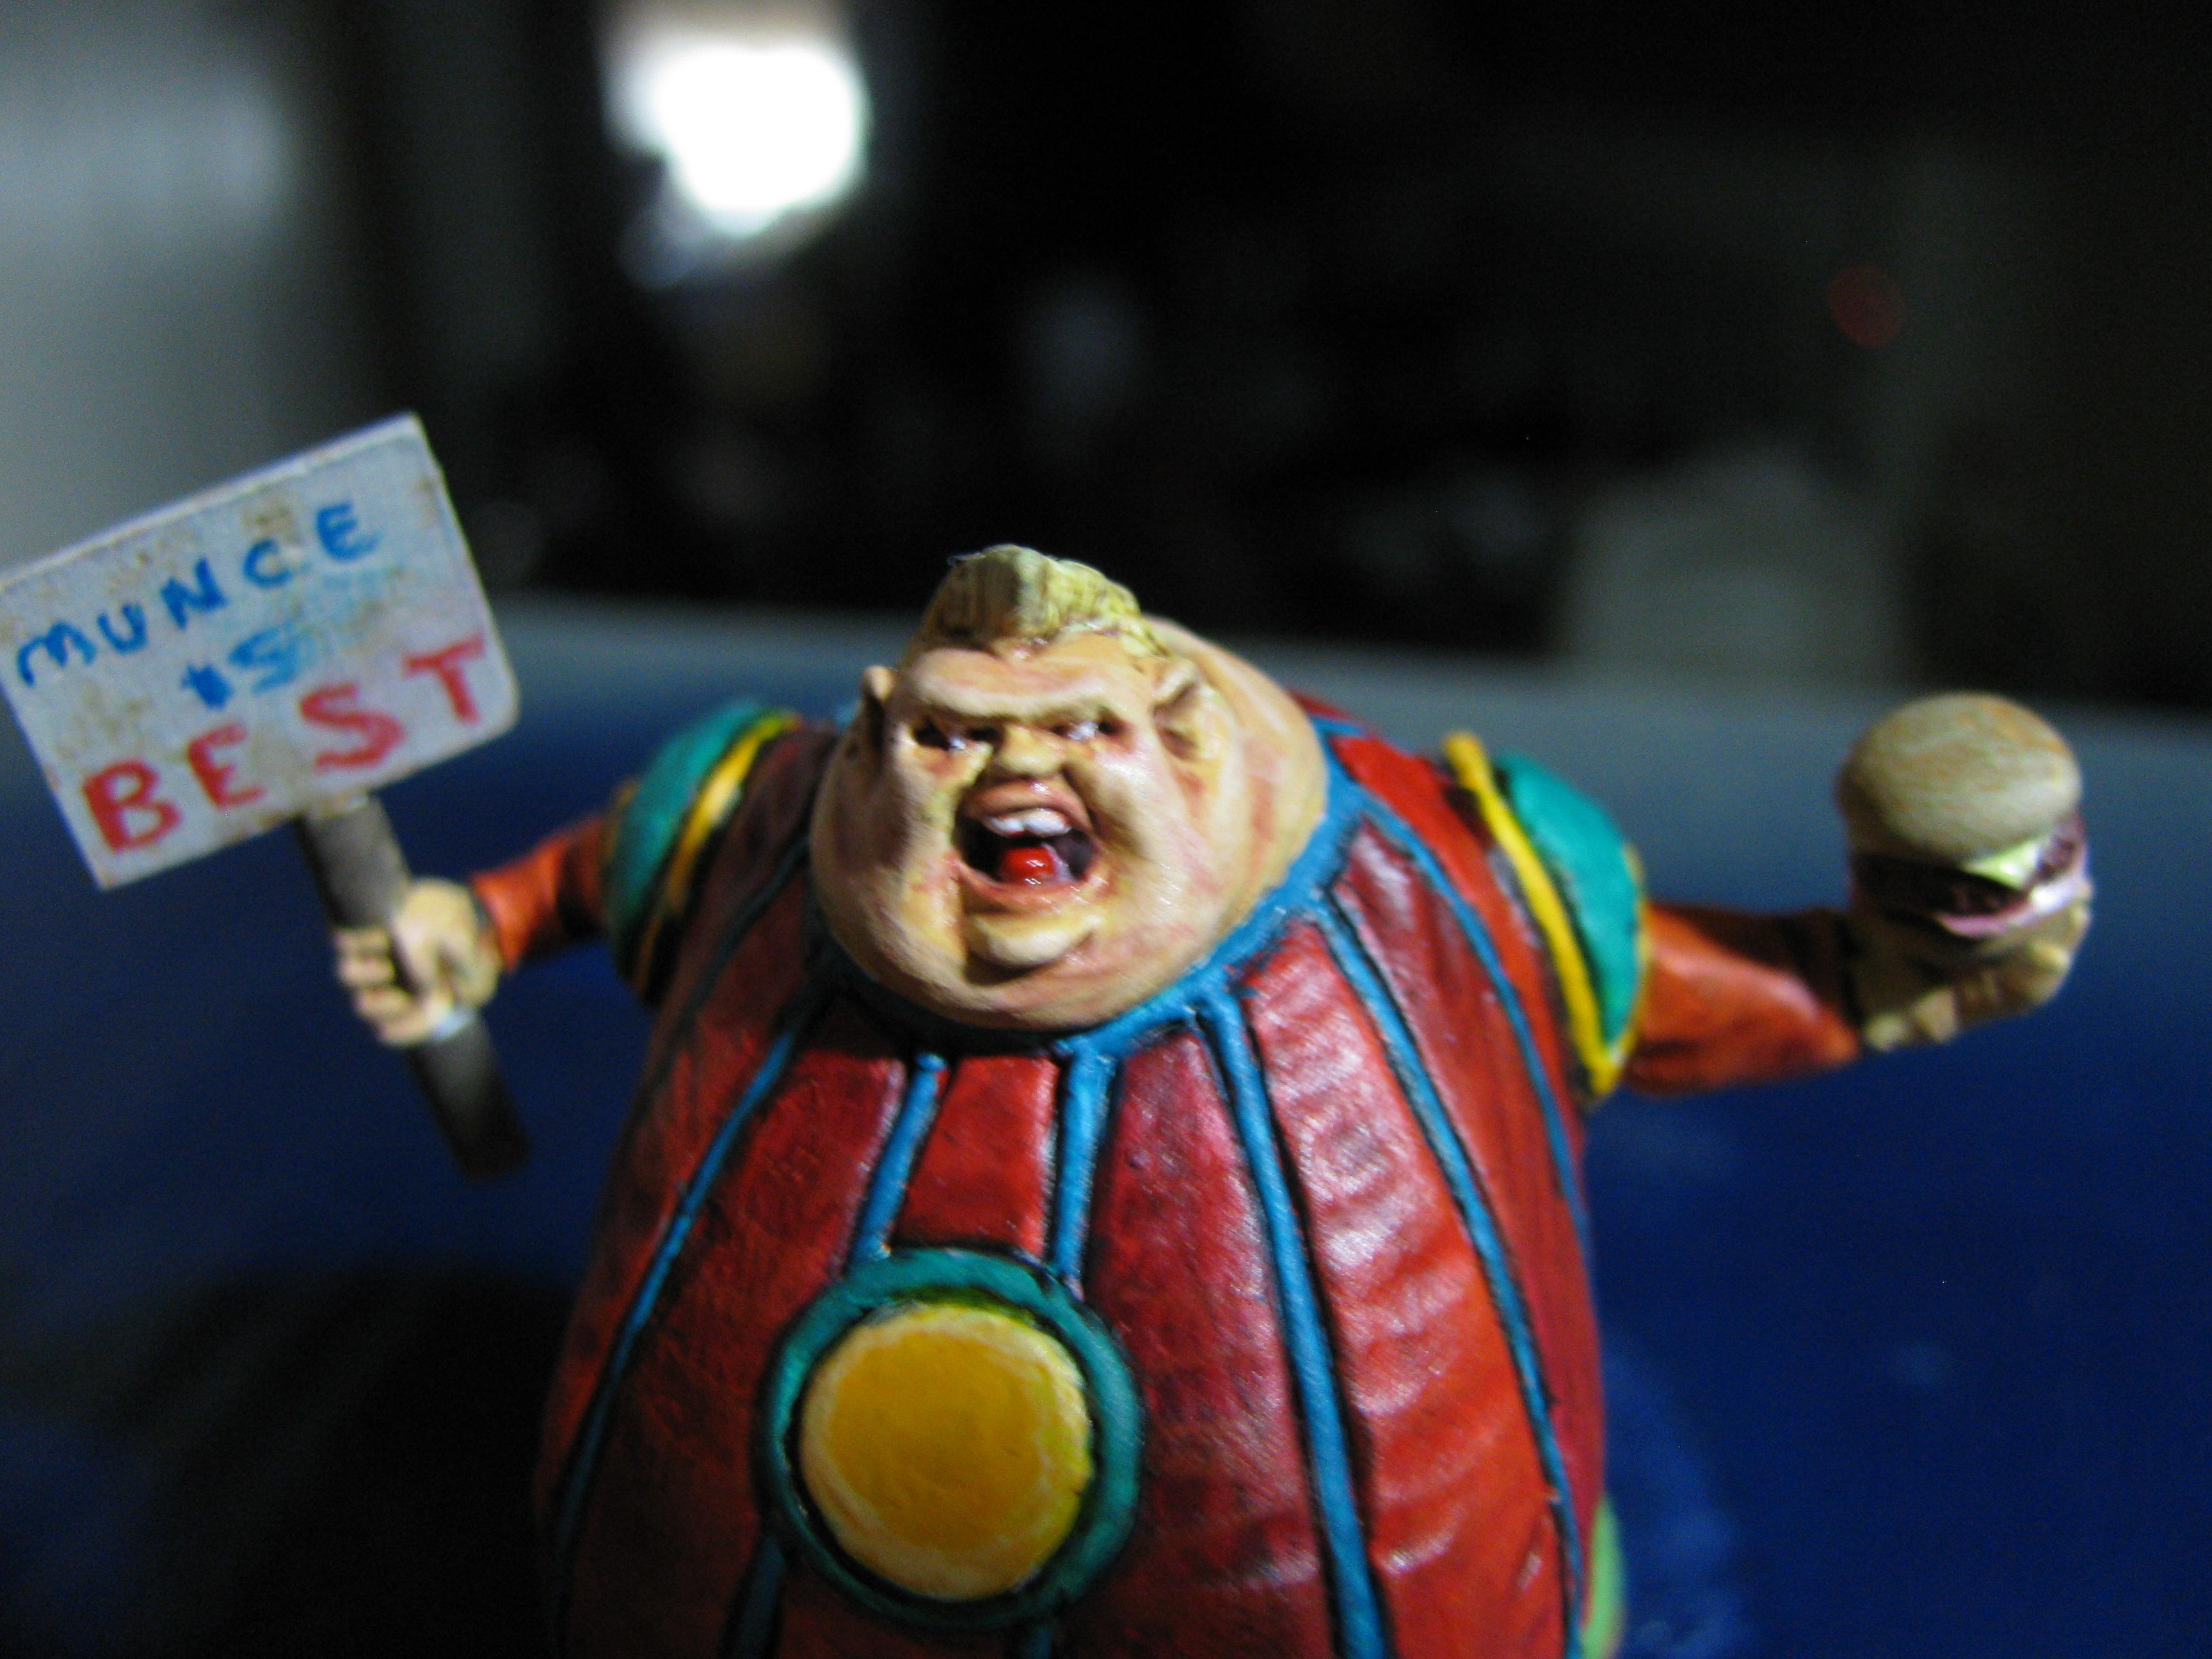 Citizens, Fatty, Judge Dredd